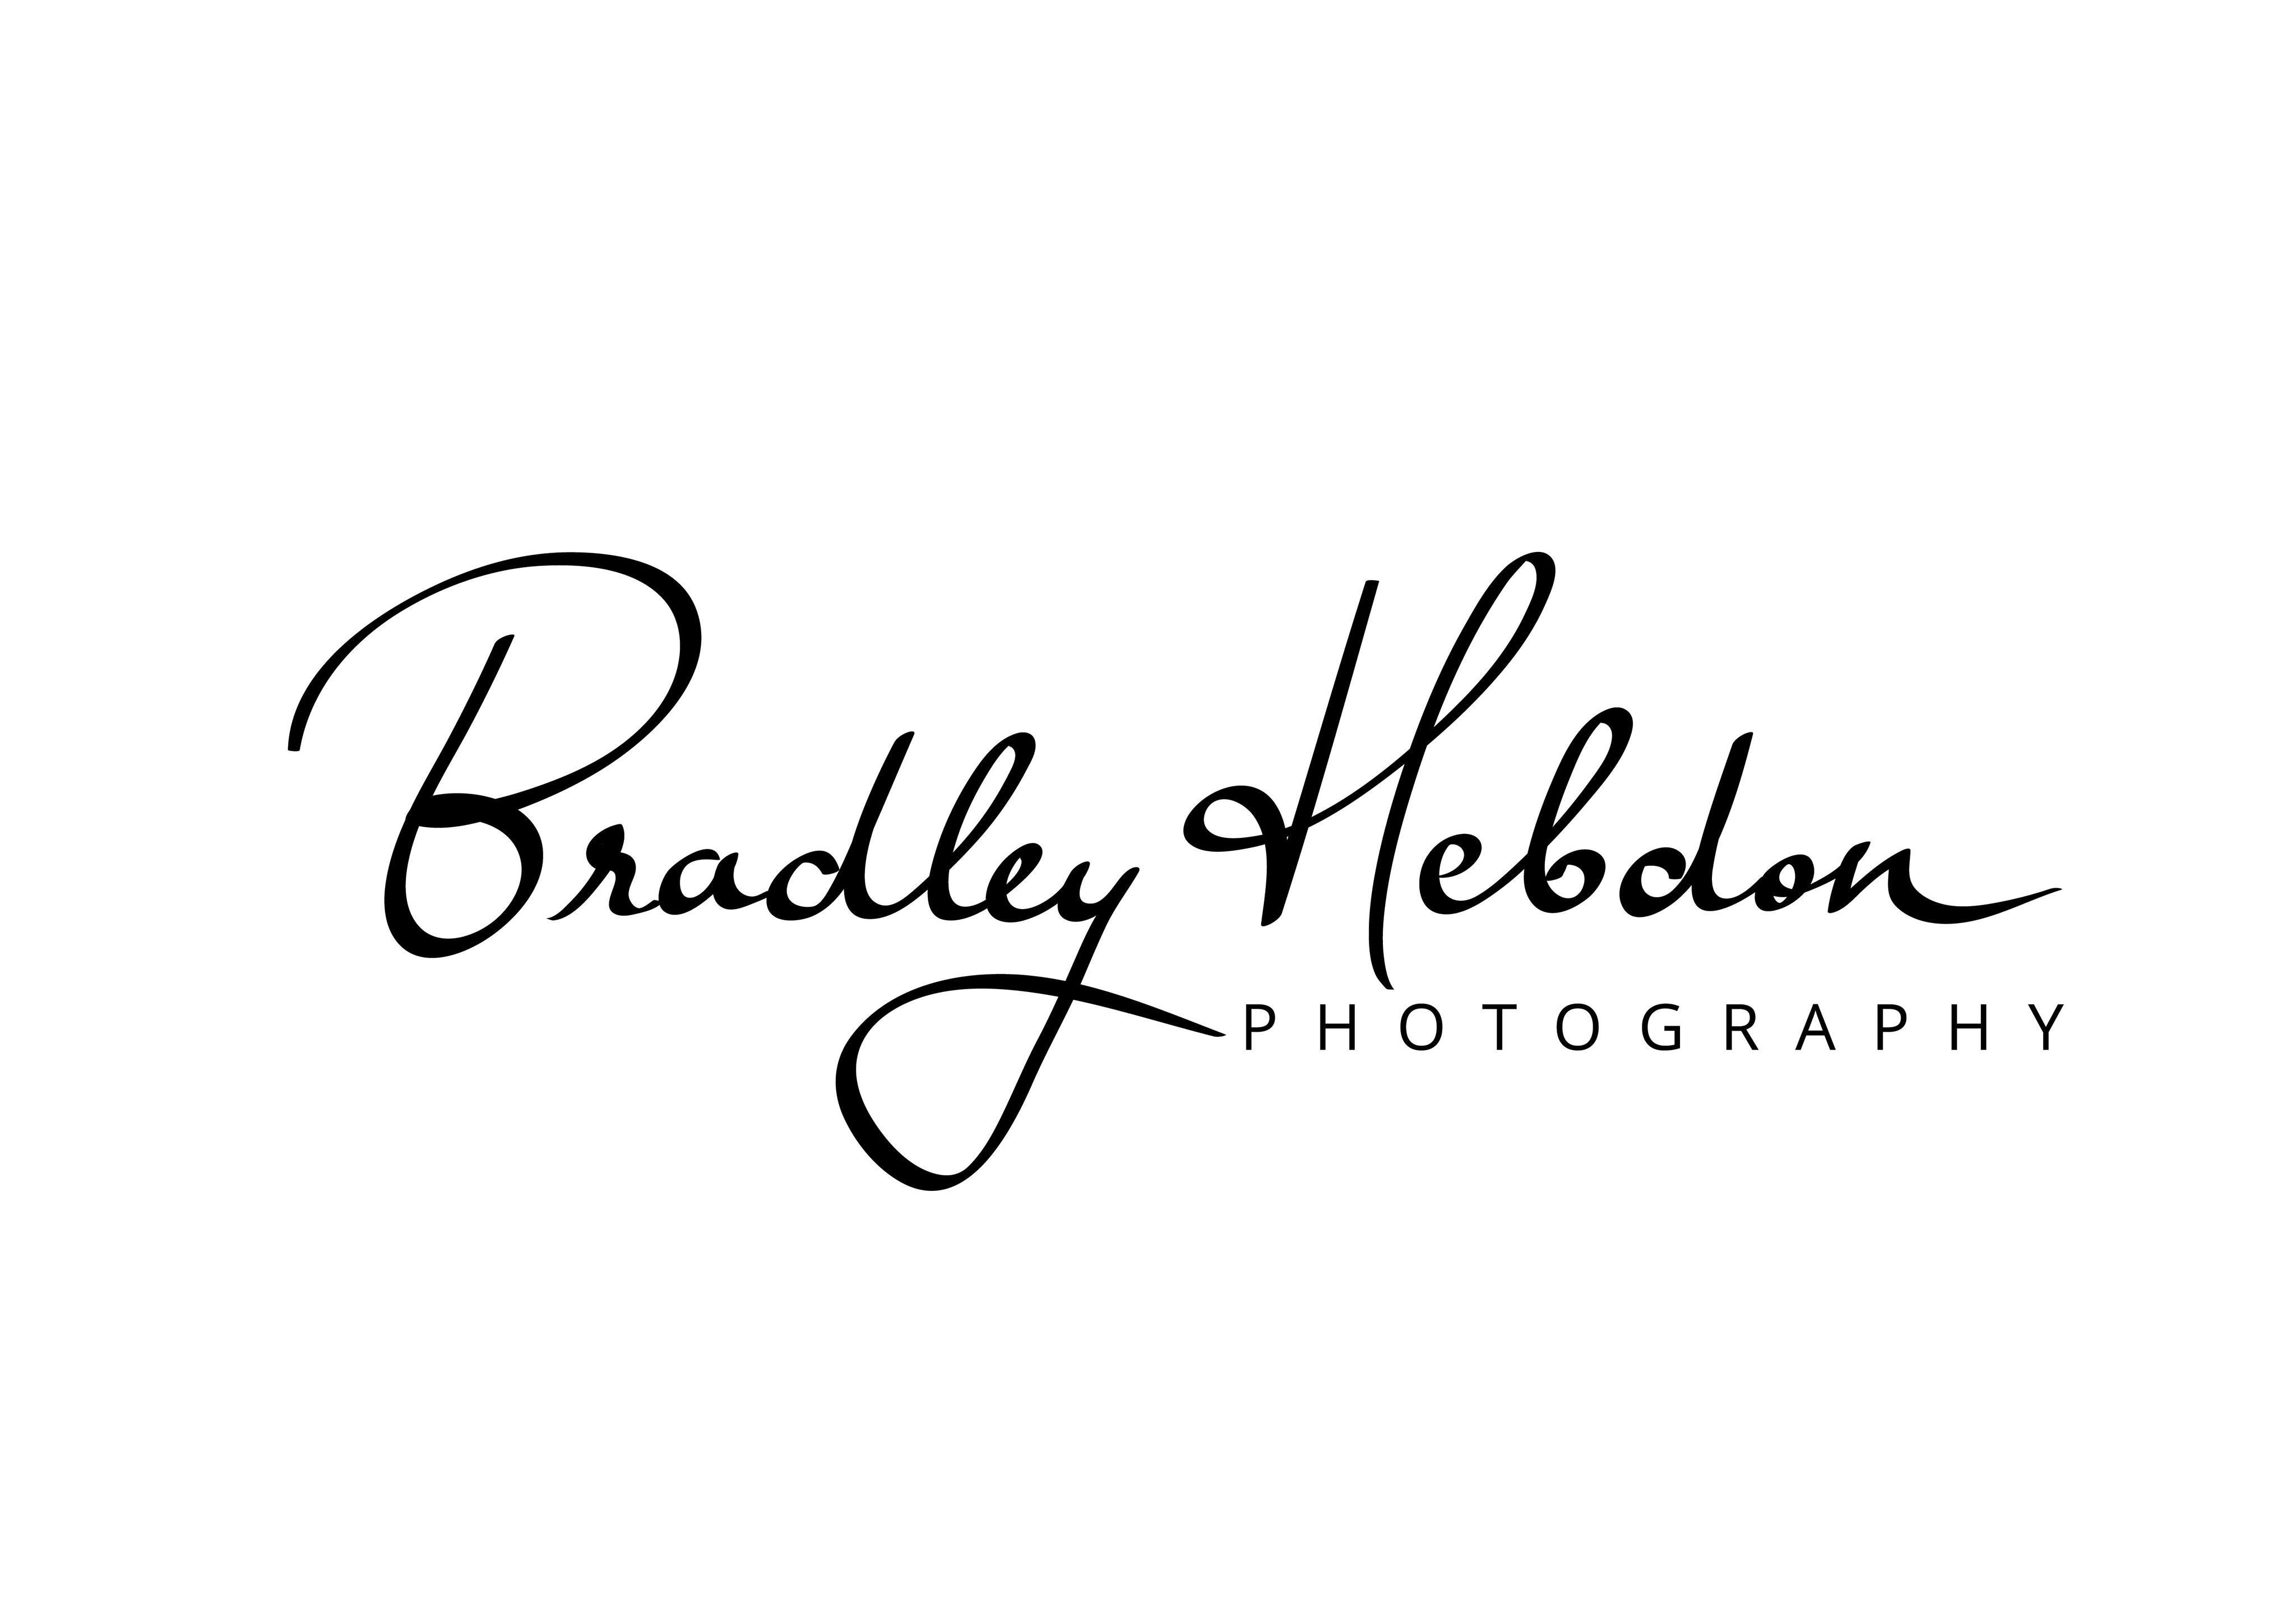 Bradley Hebdon